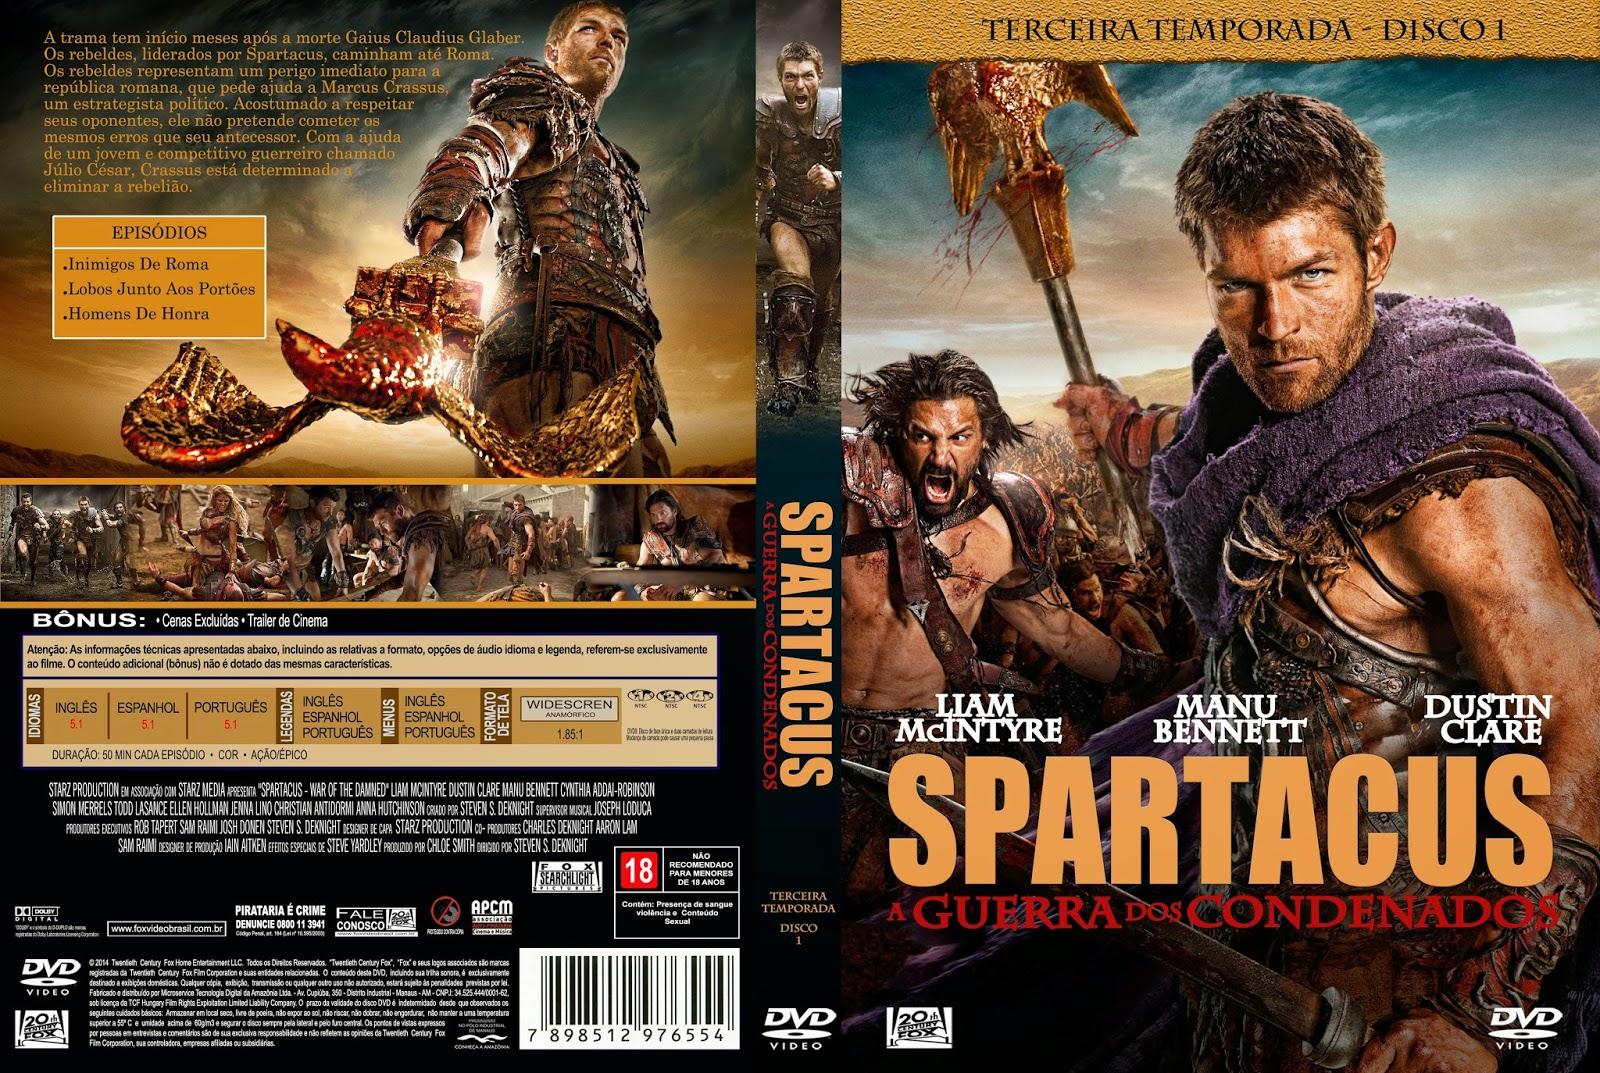 Filme Spartacus with regard to spartacus a guerra dos condenados - temporada 03 - capas de filmes